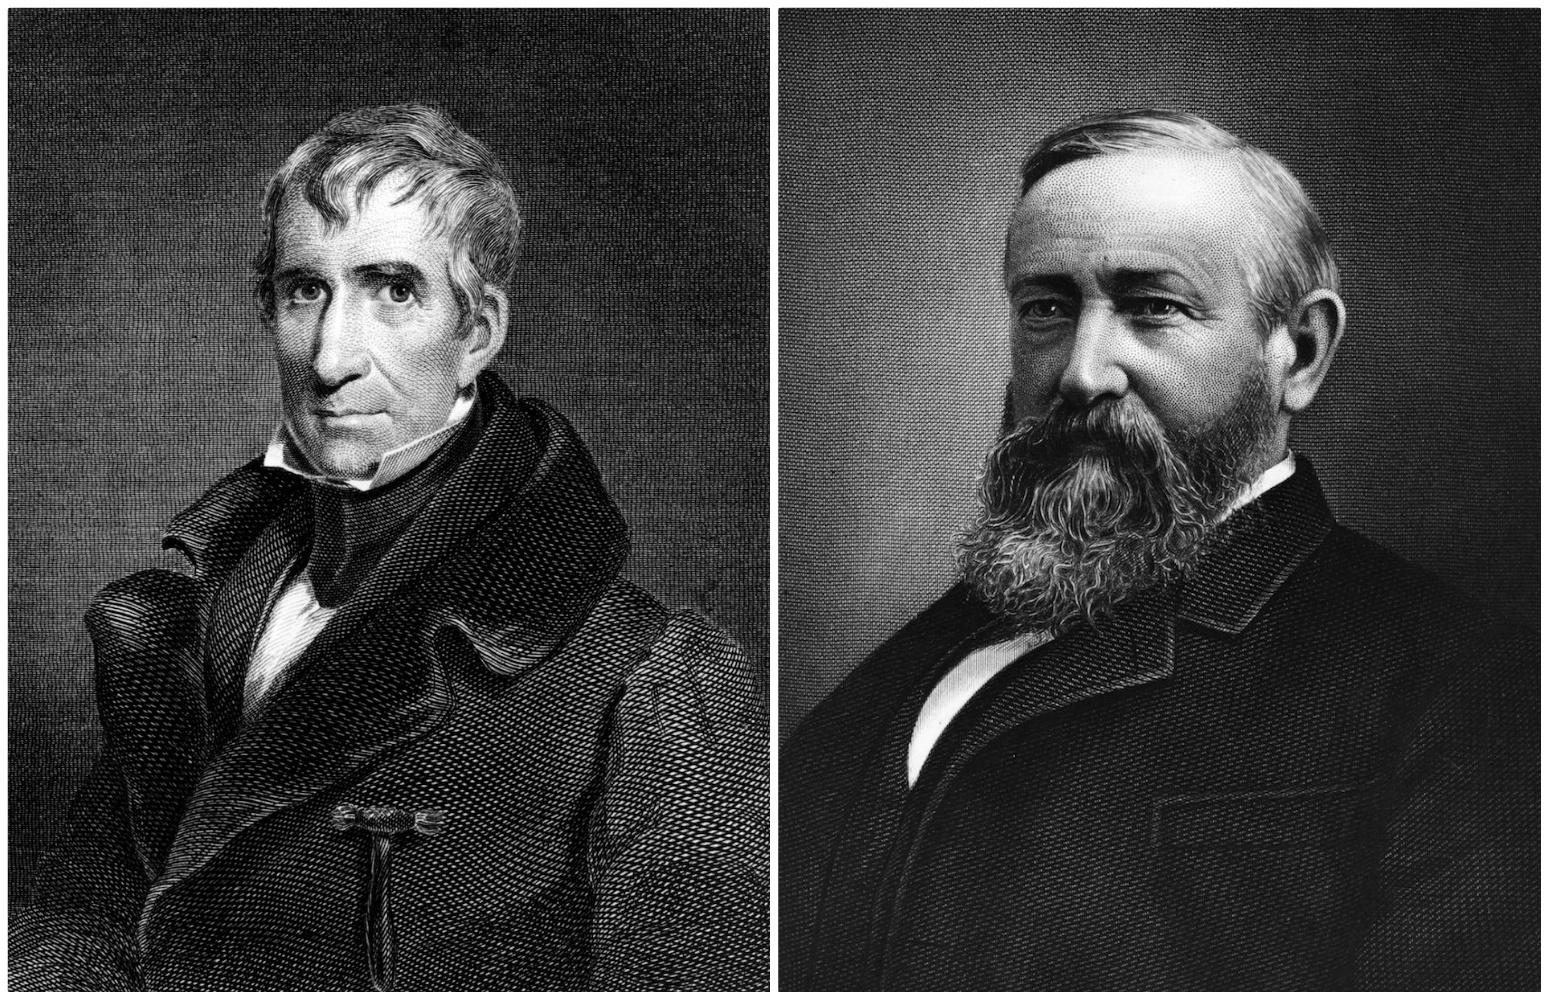 William Henry and Benjamin Harrison